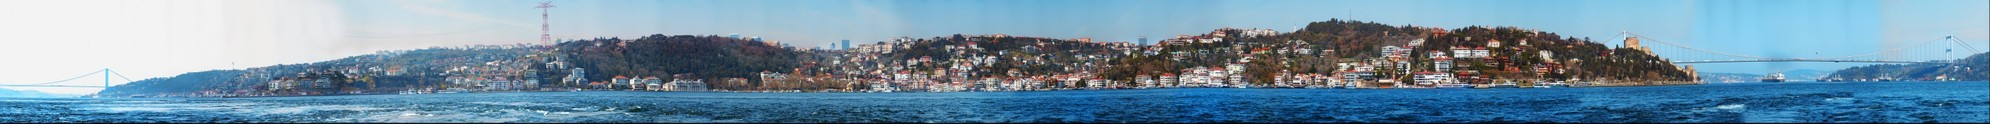 Istanbul Bosphorus Panorama from Kandilli